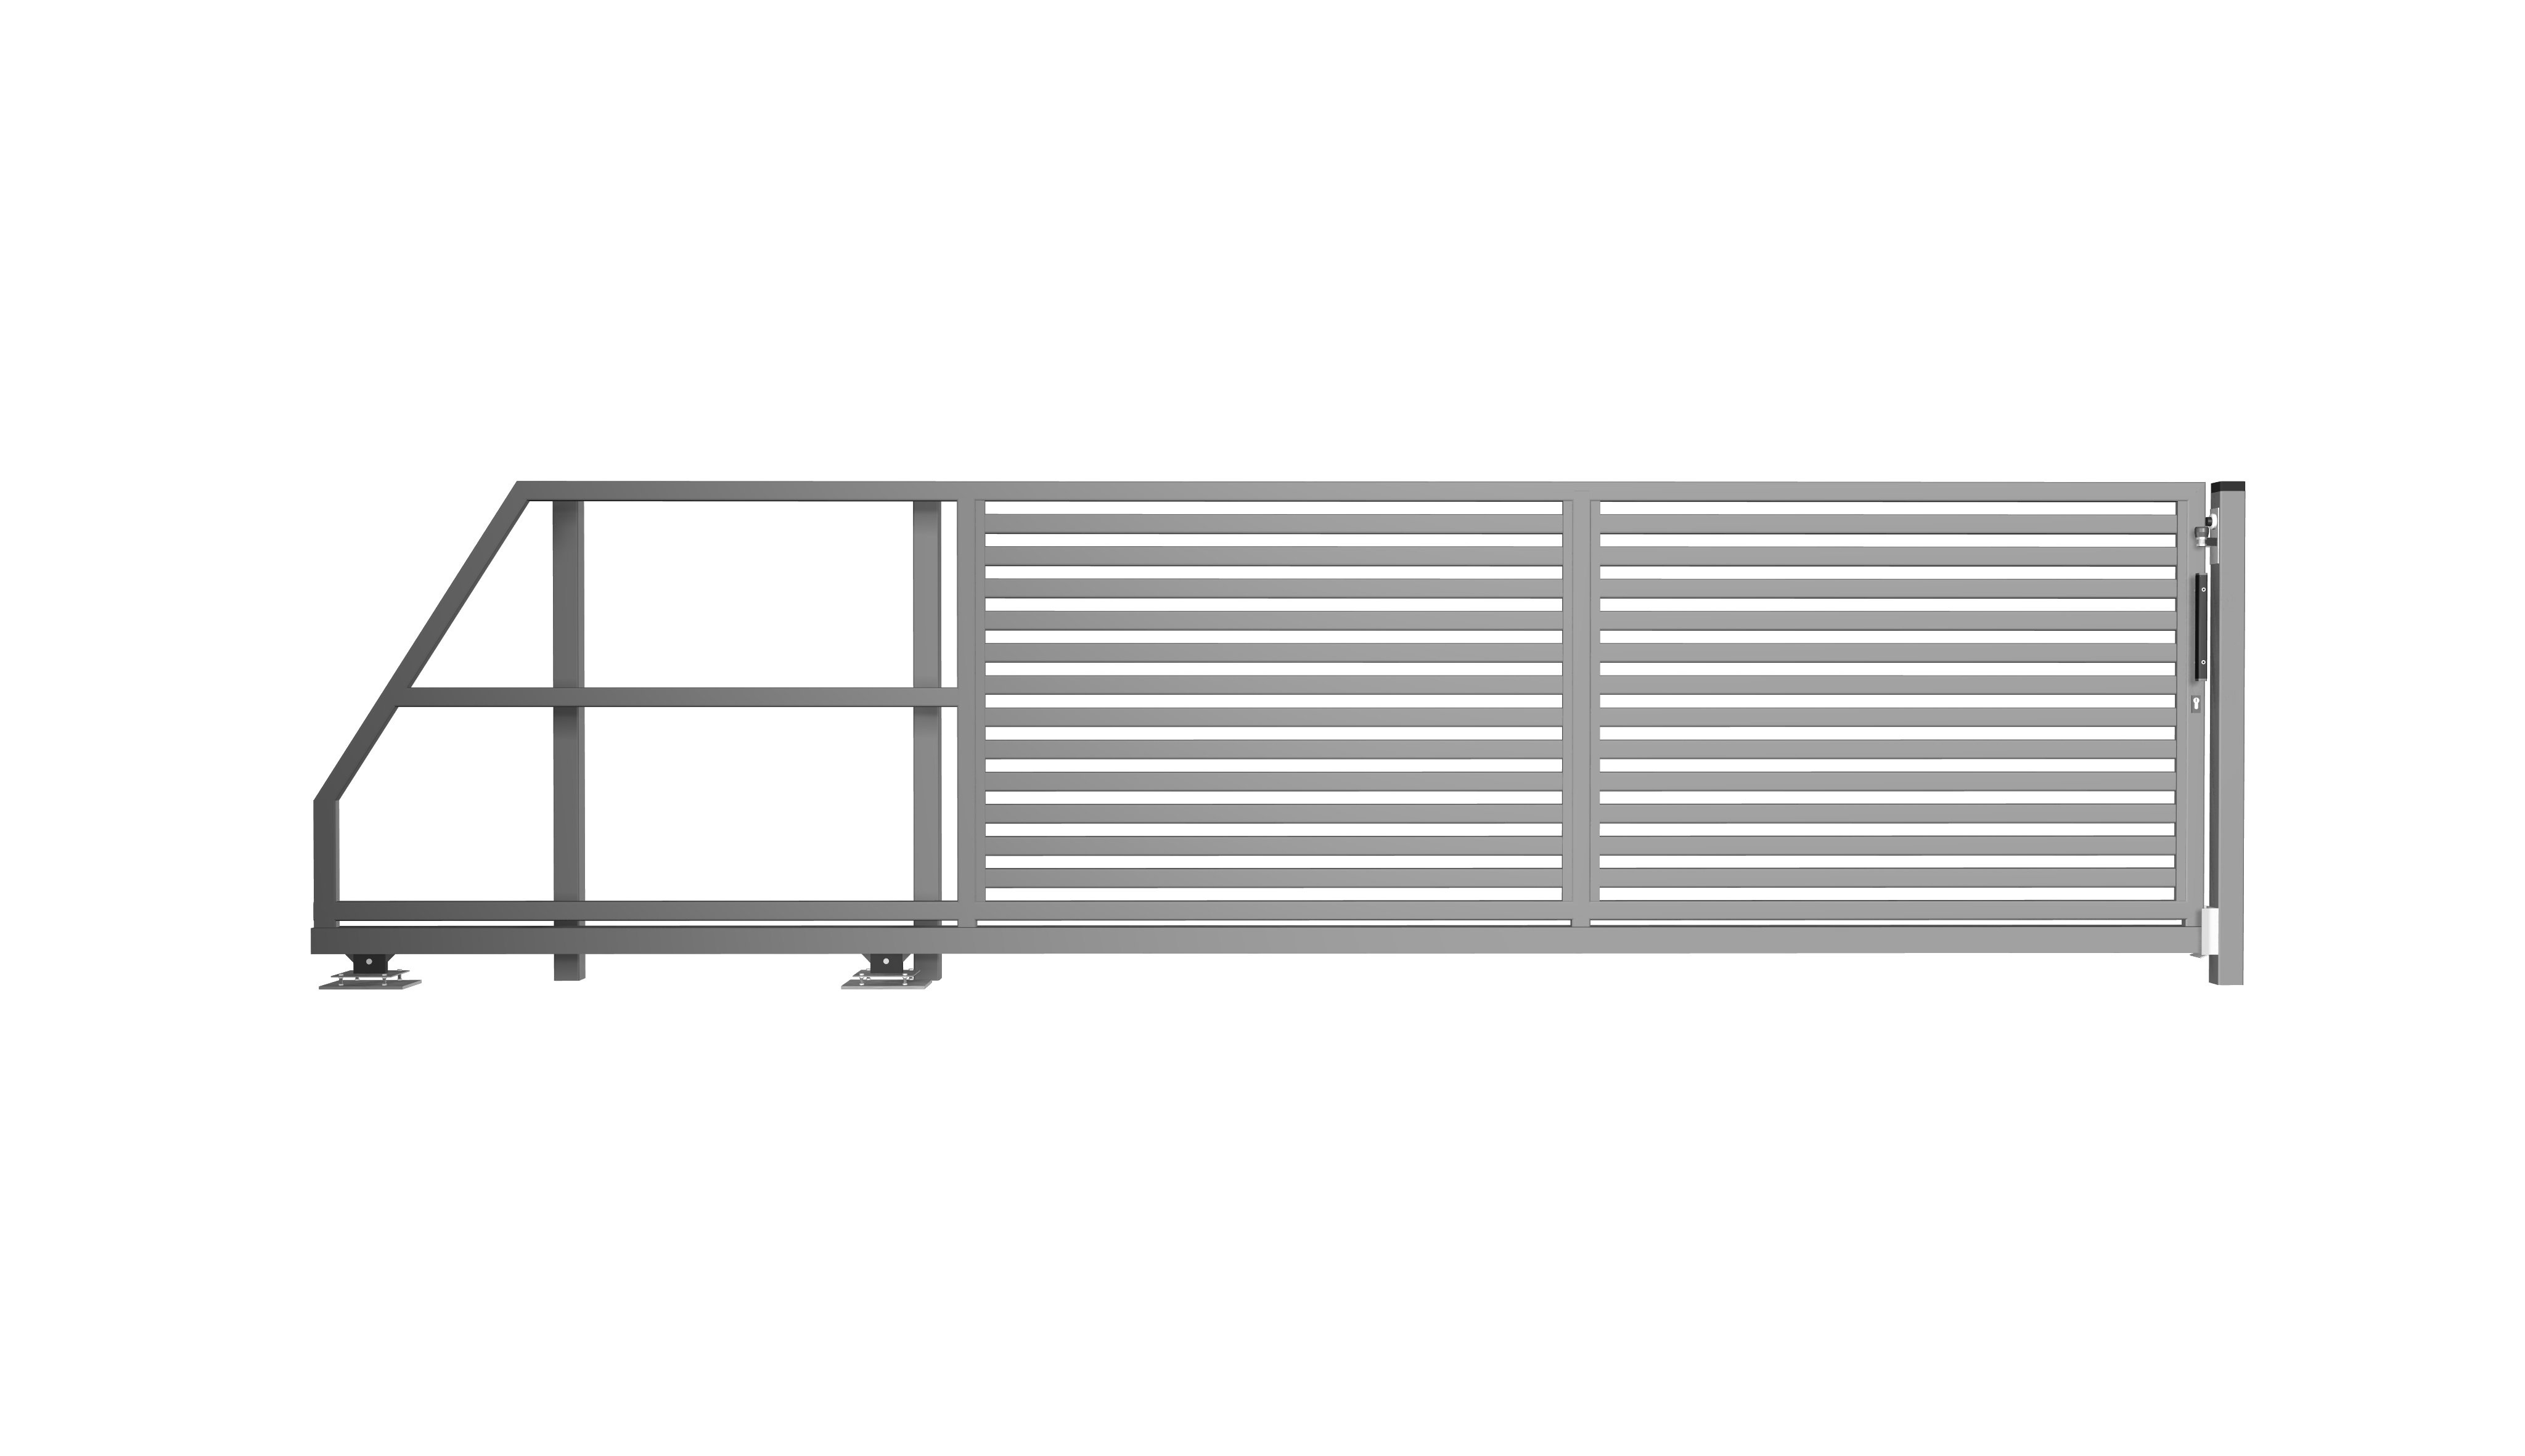 brama suwana palisada pozioma p63